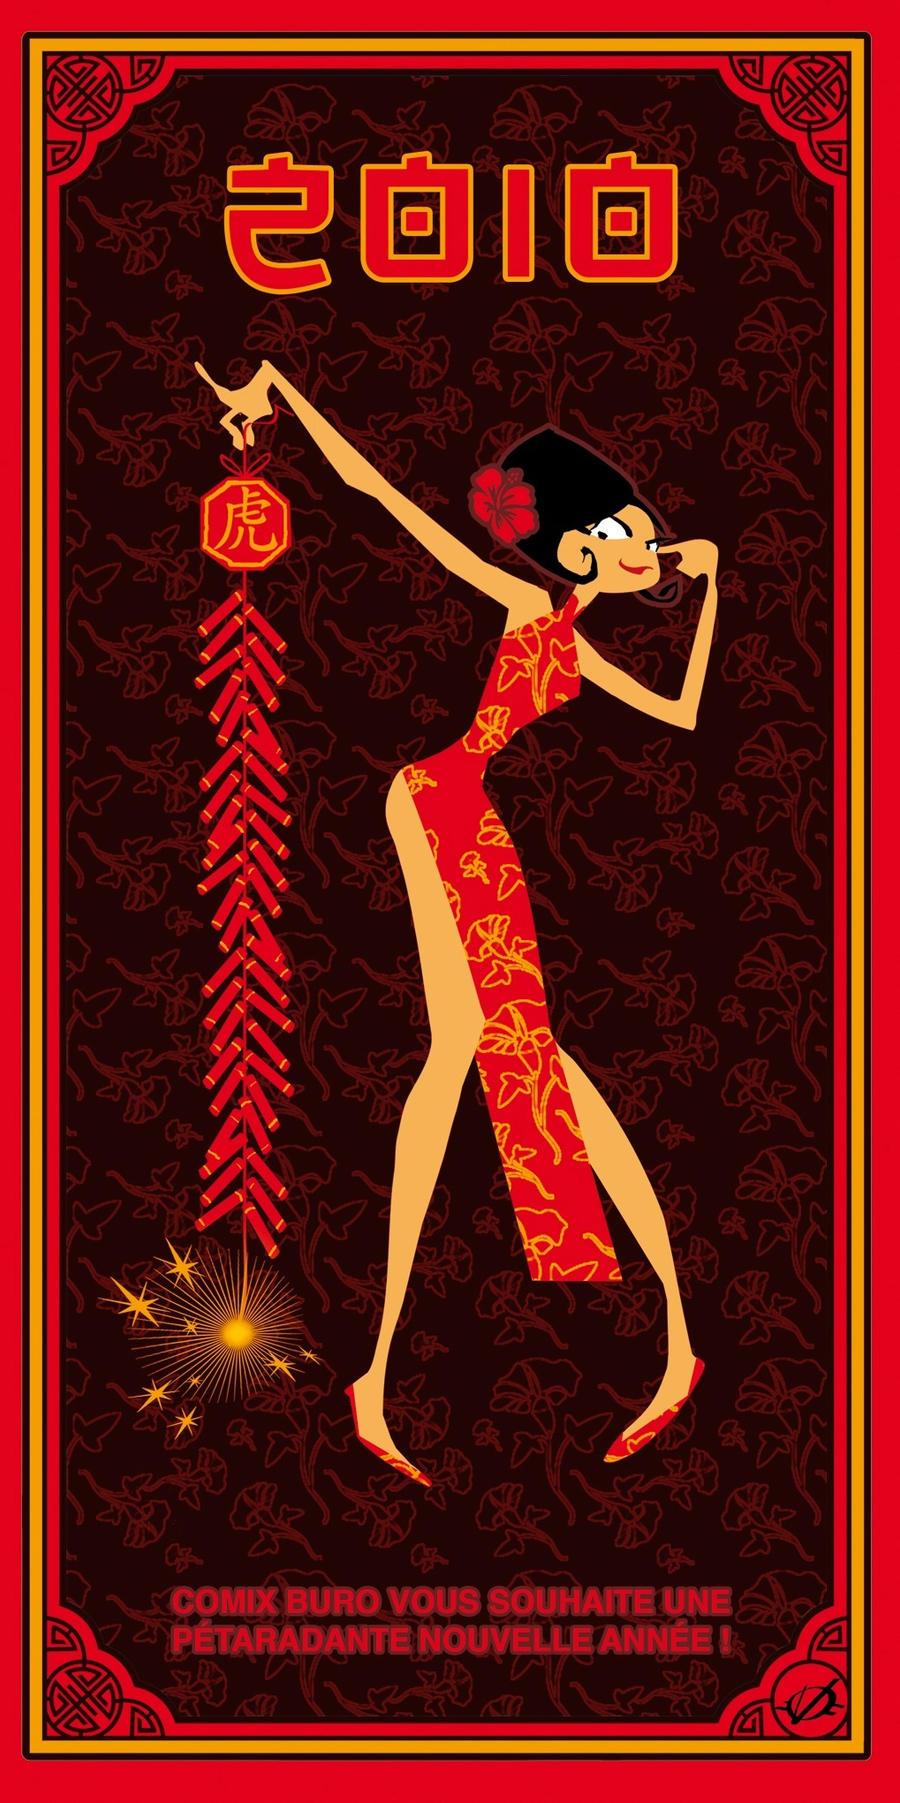 Comix Buro Greeting Card 2010 by lao-wa